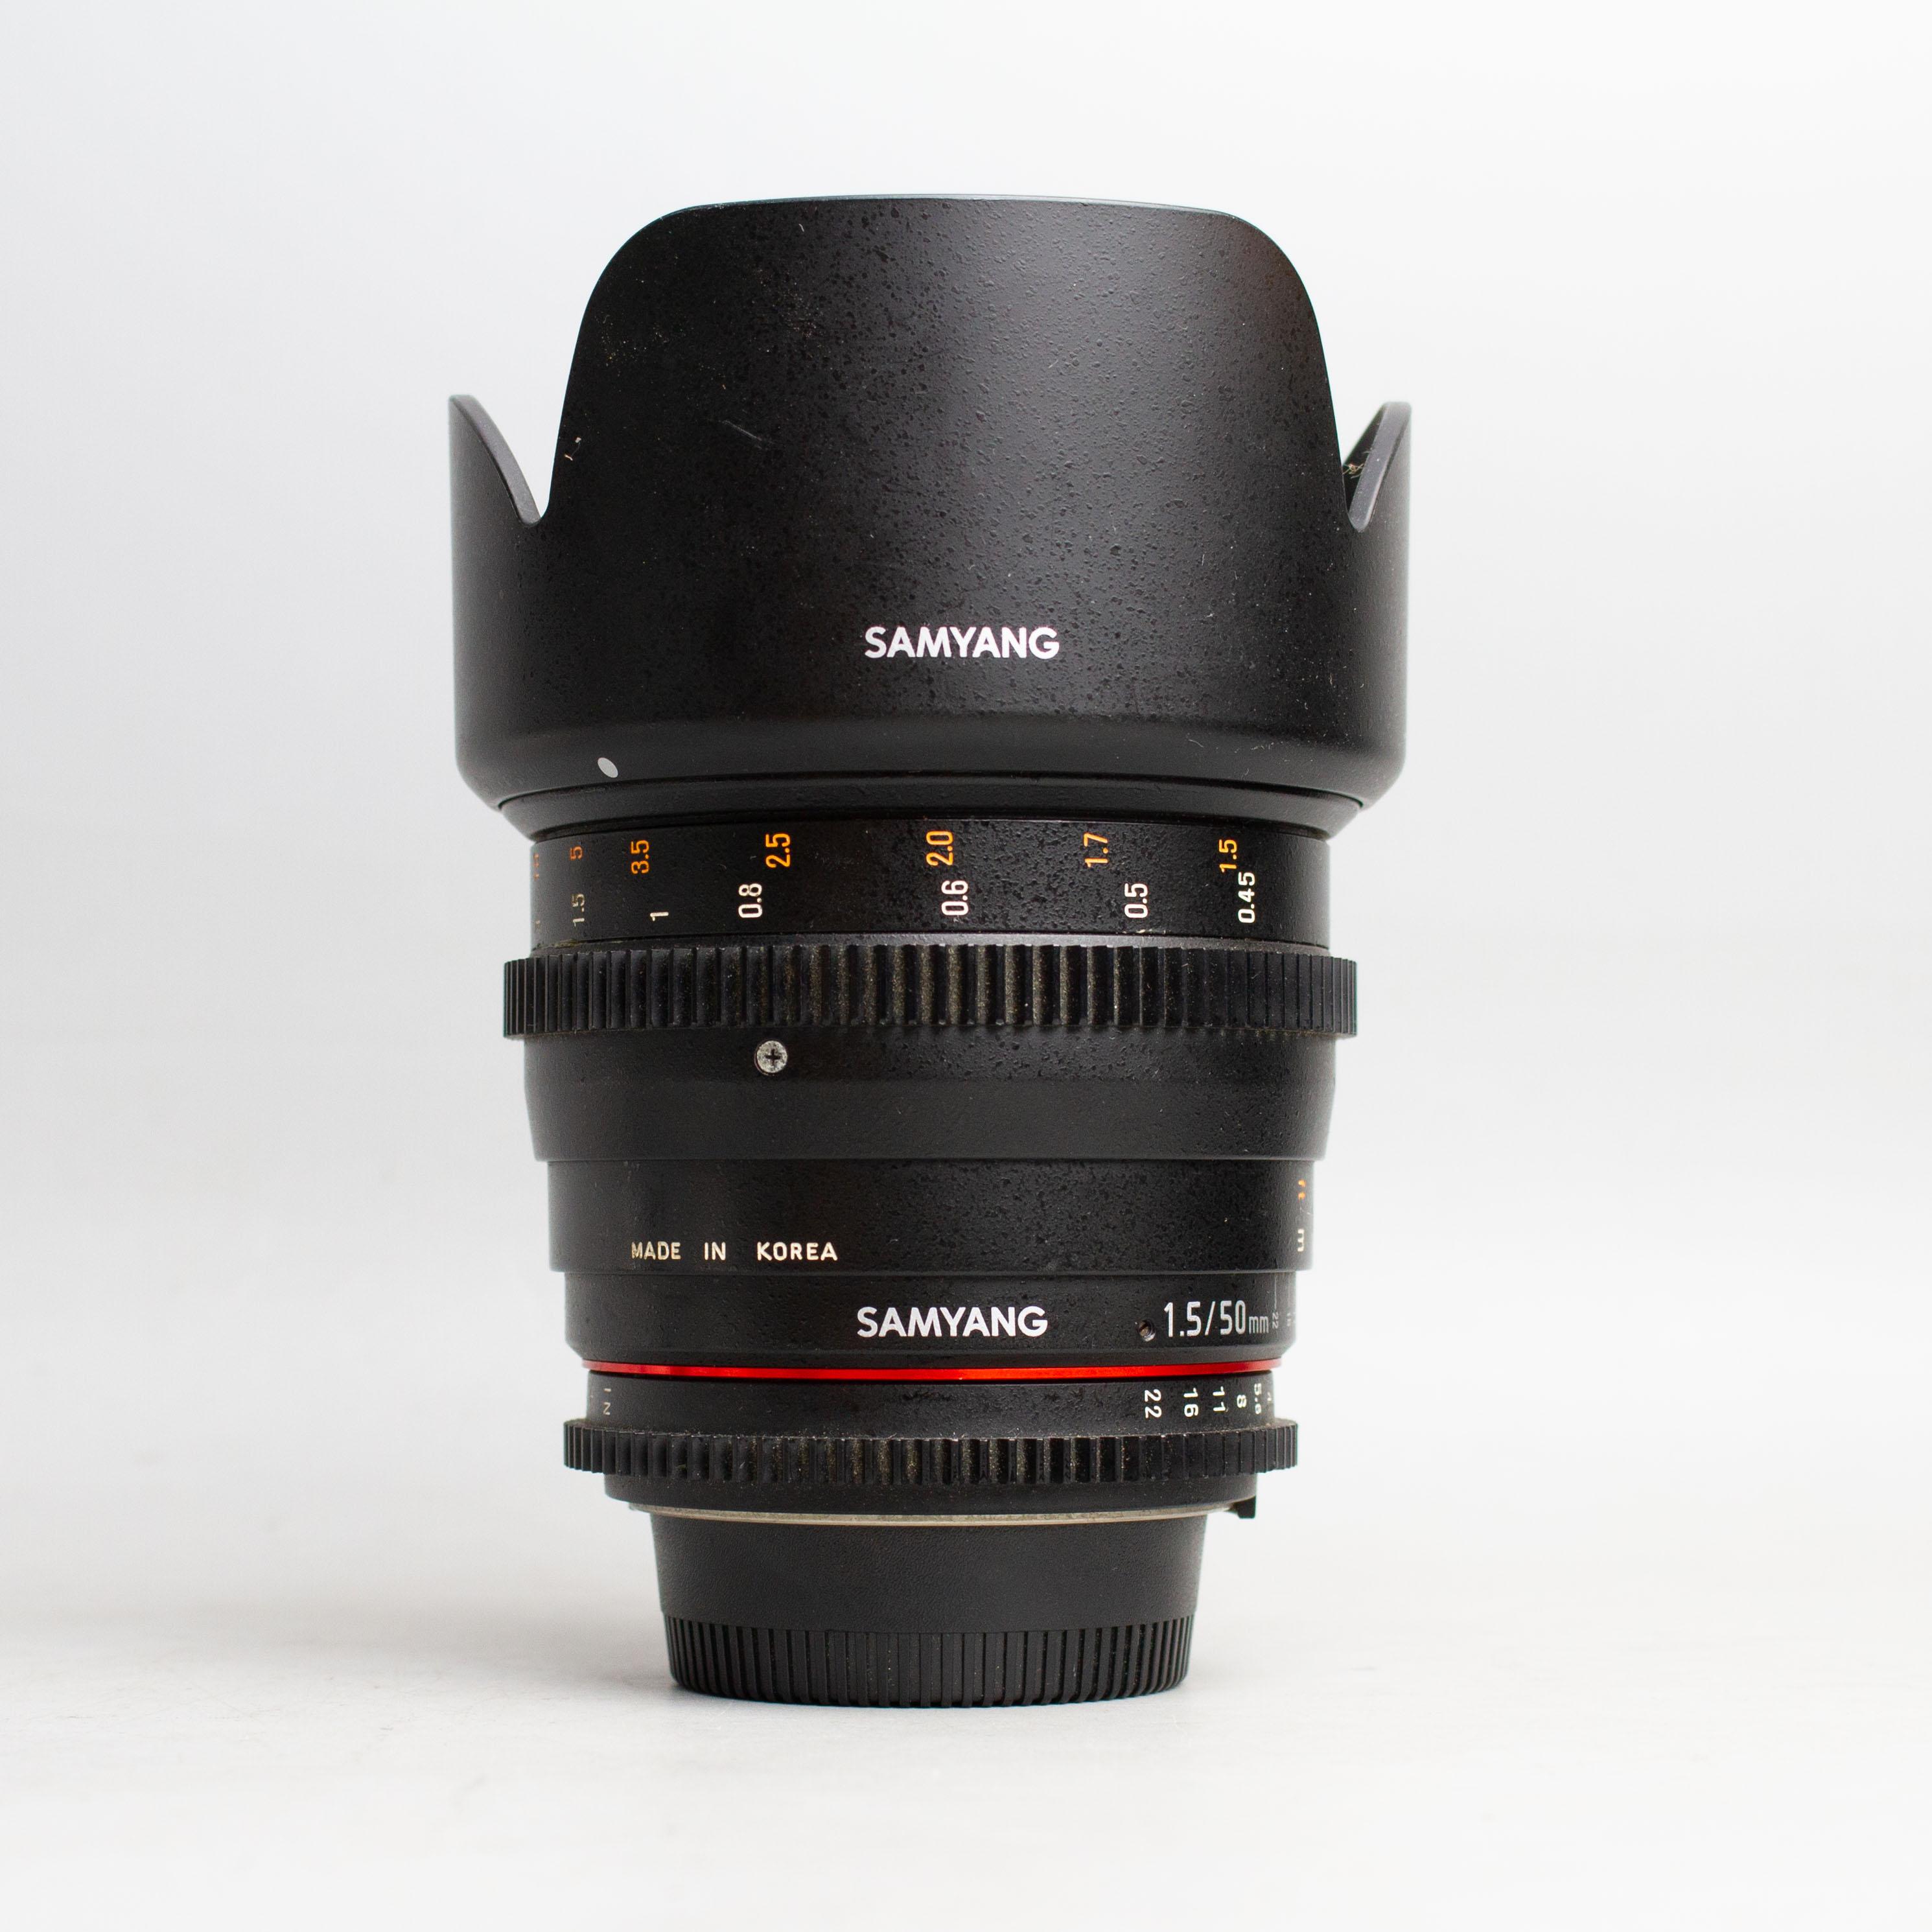 samyang-50mm-t1-5-cine-nikon-mf-50-1-4-15766